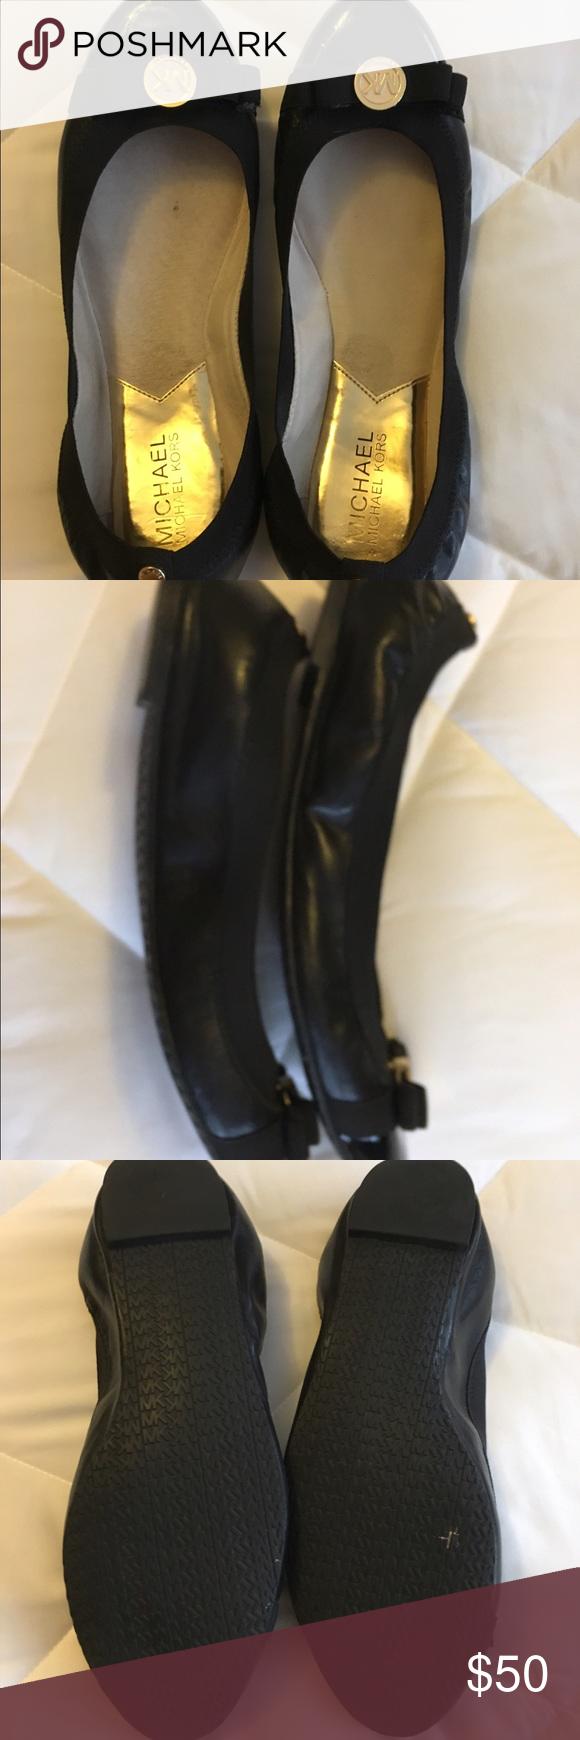 Michael Kors Black Patent Flats Size 7.5 Very nice! MICHAEL Michael Kors Shoes Flats & Loafers